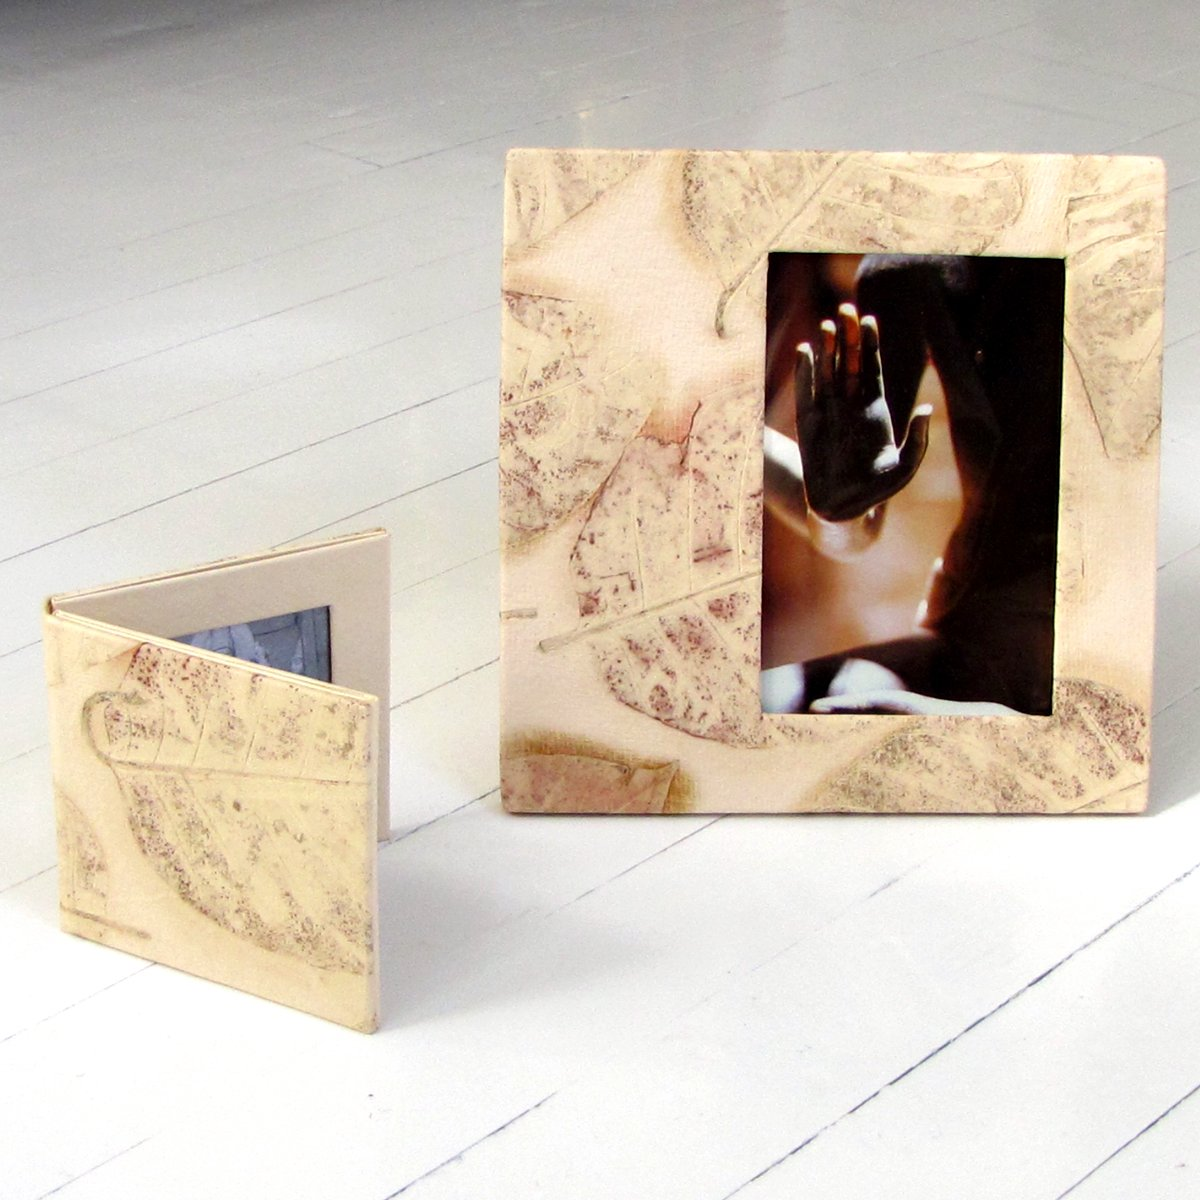 2 wedding photos frame set 4x4 and 8x8 handmade cream leaf imprint paper